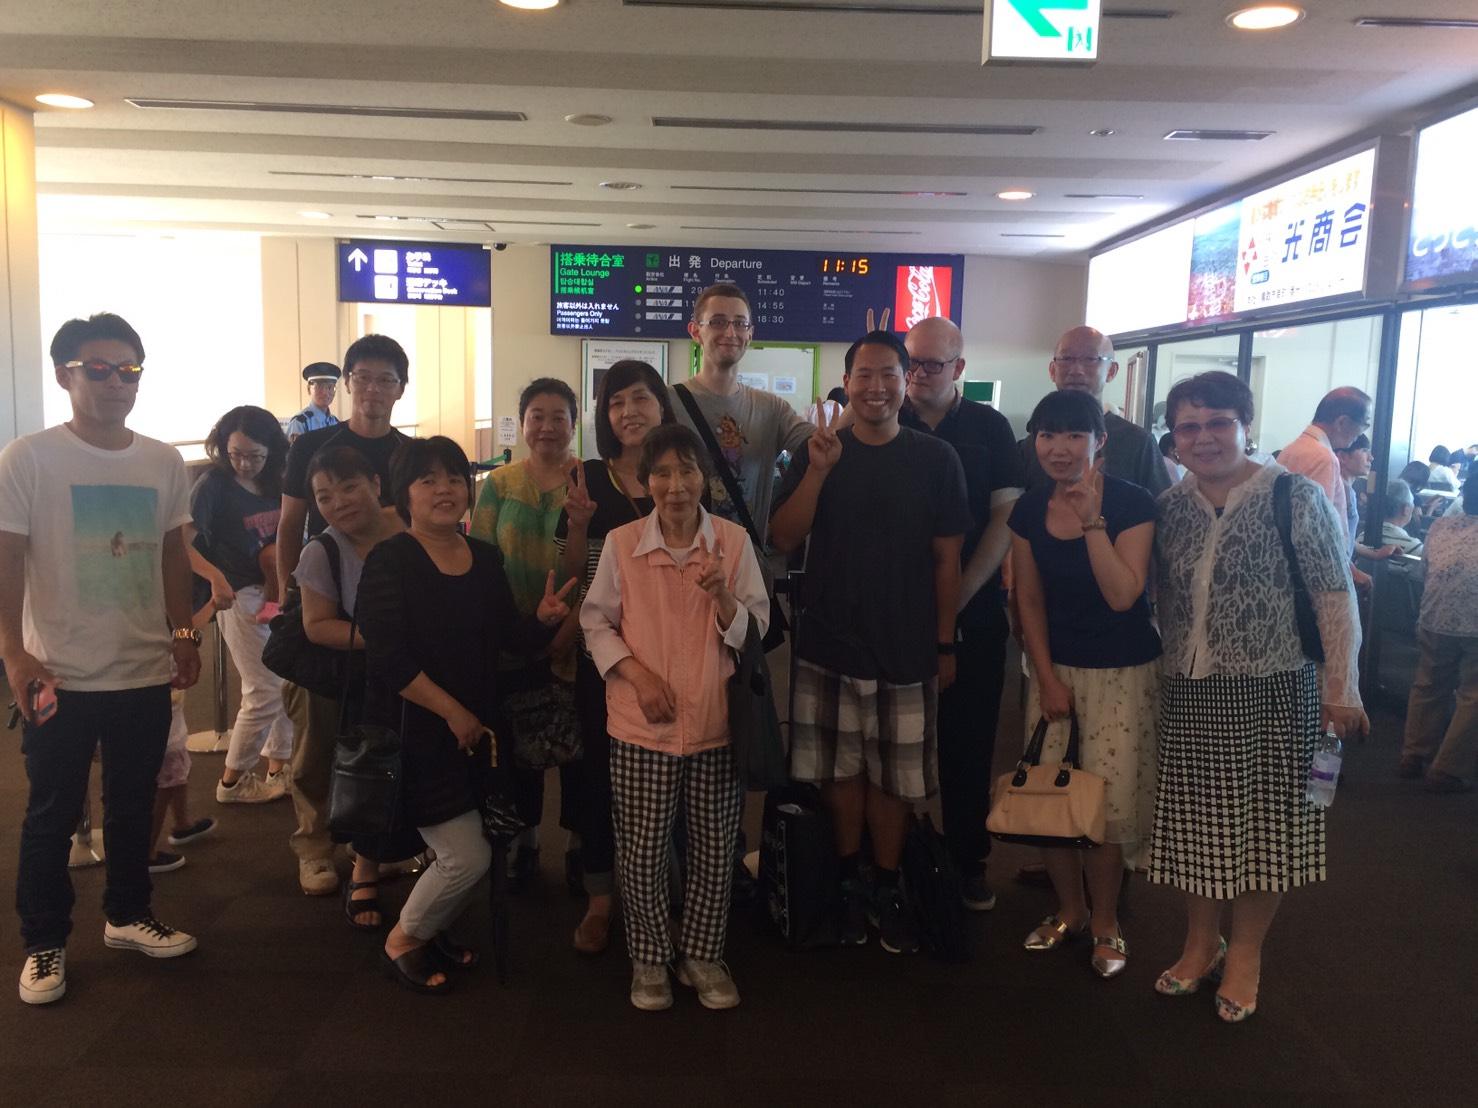 departing Tottori